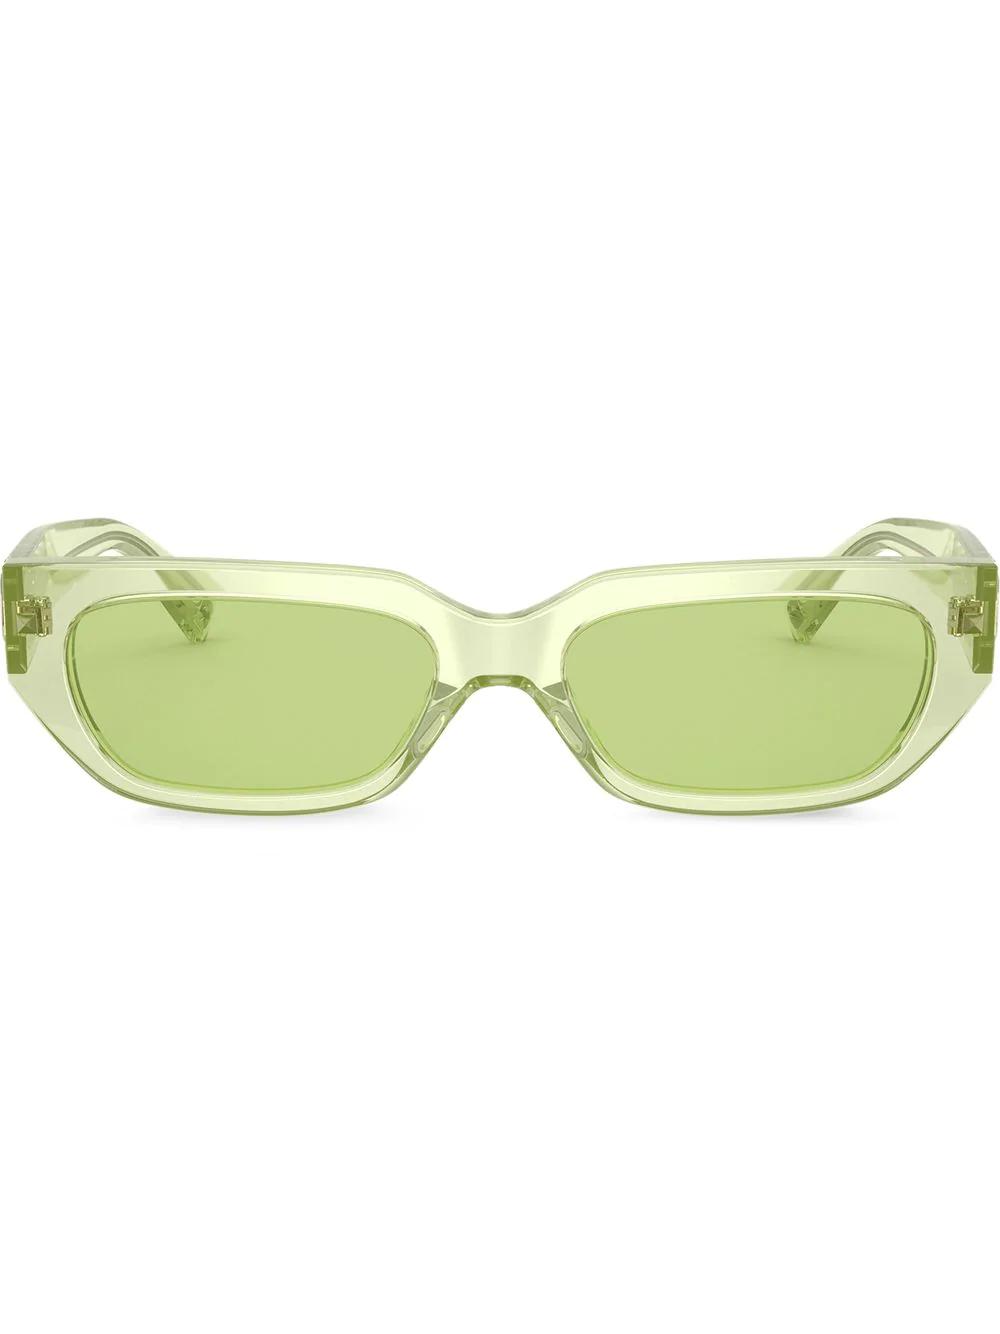 Valentino Eyewear 424лв